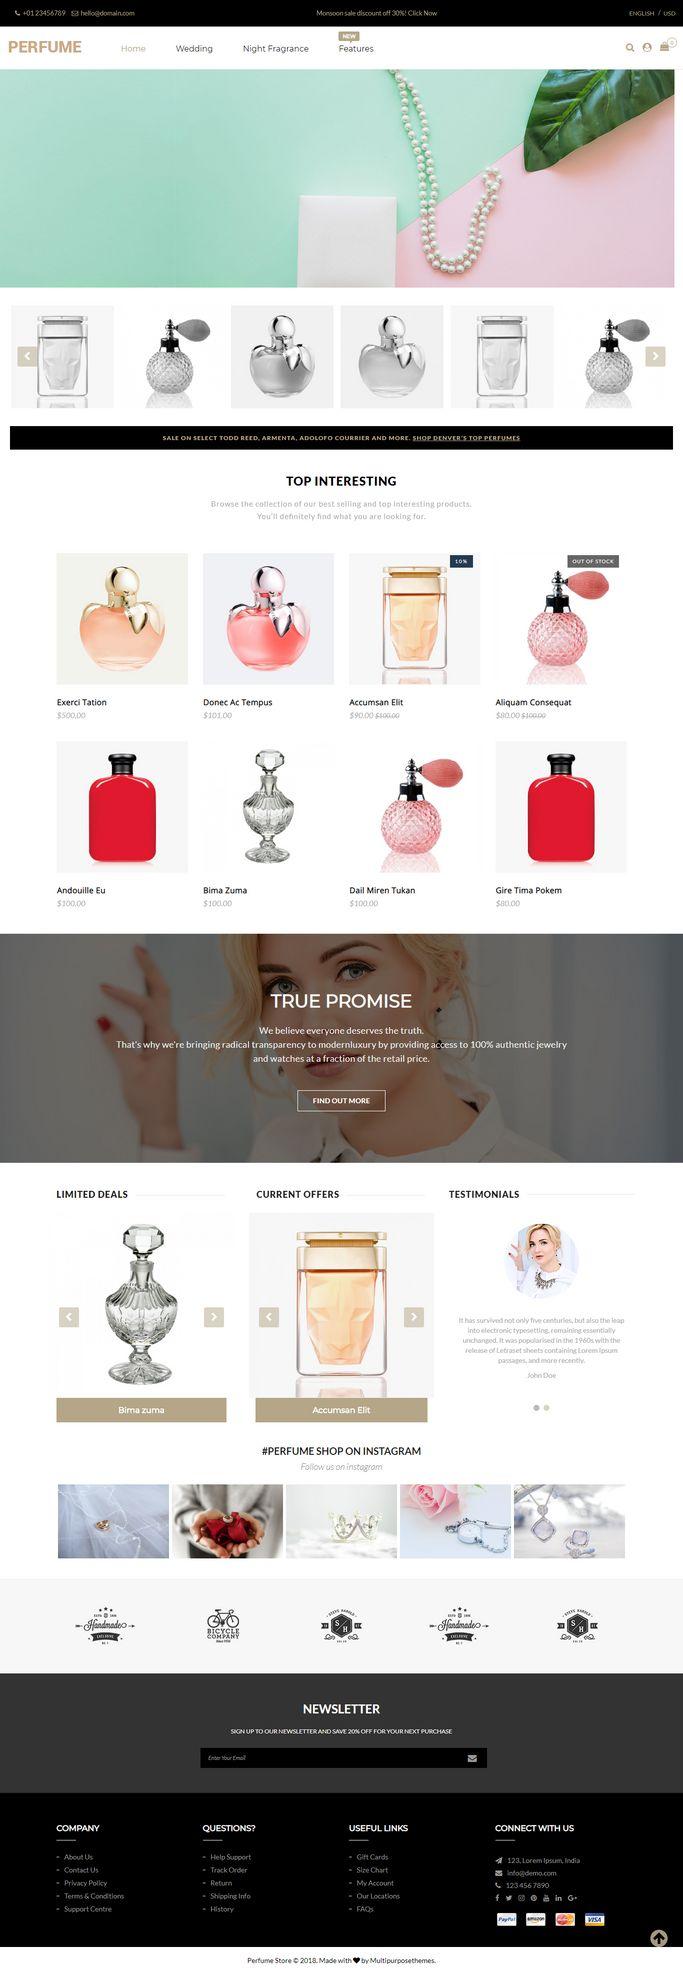 screencapture-opencart-multipurposethemes-perfume-oc05-2018-11-20-13_37_46